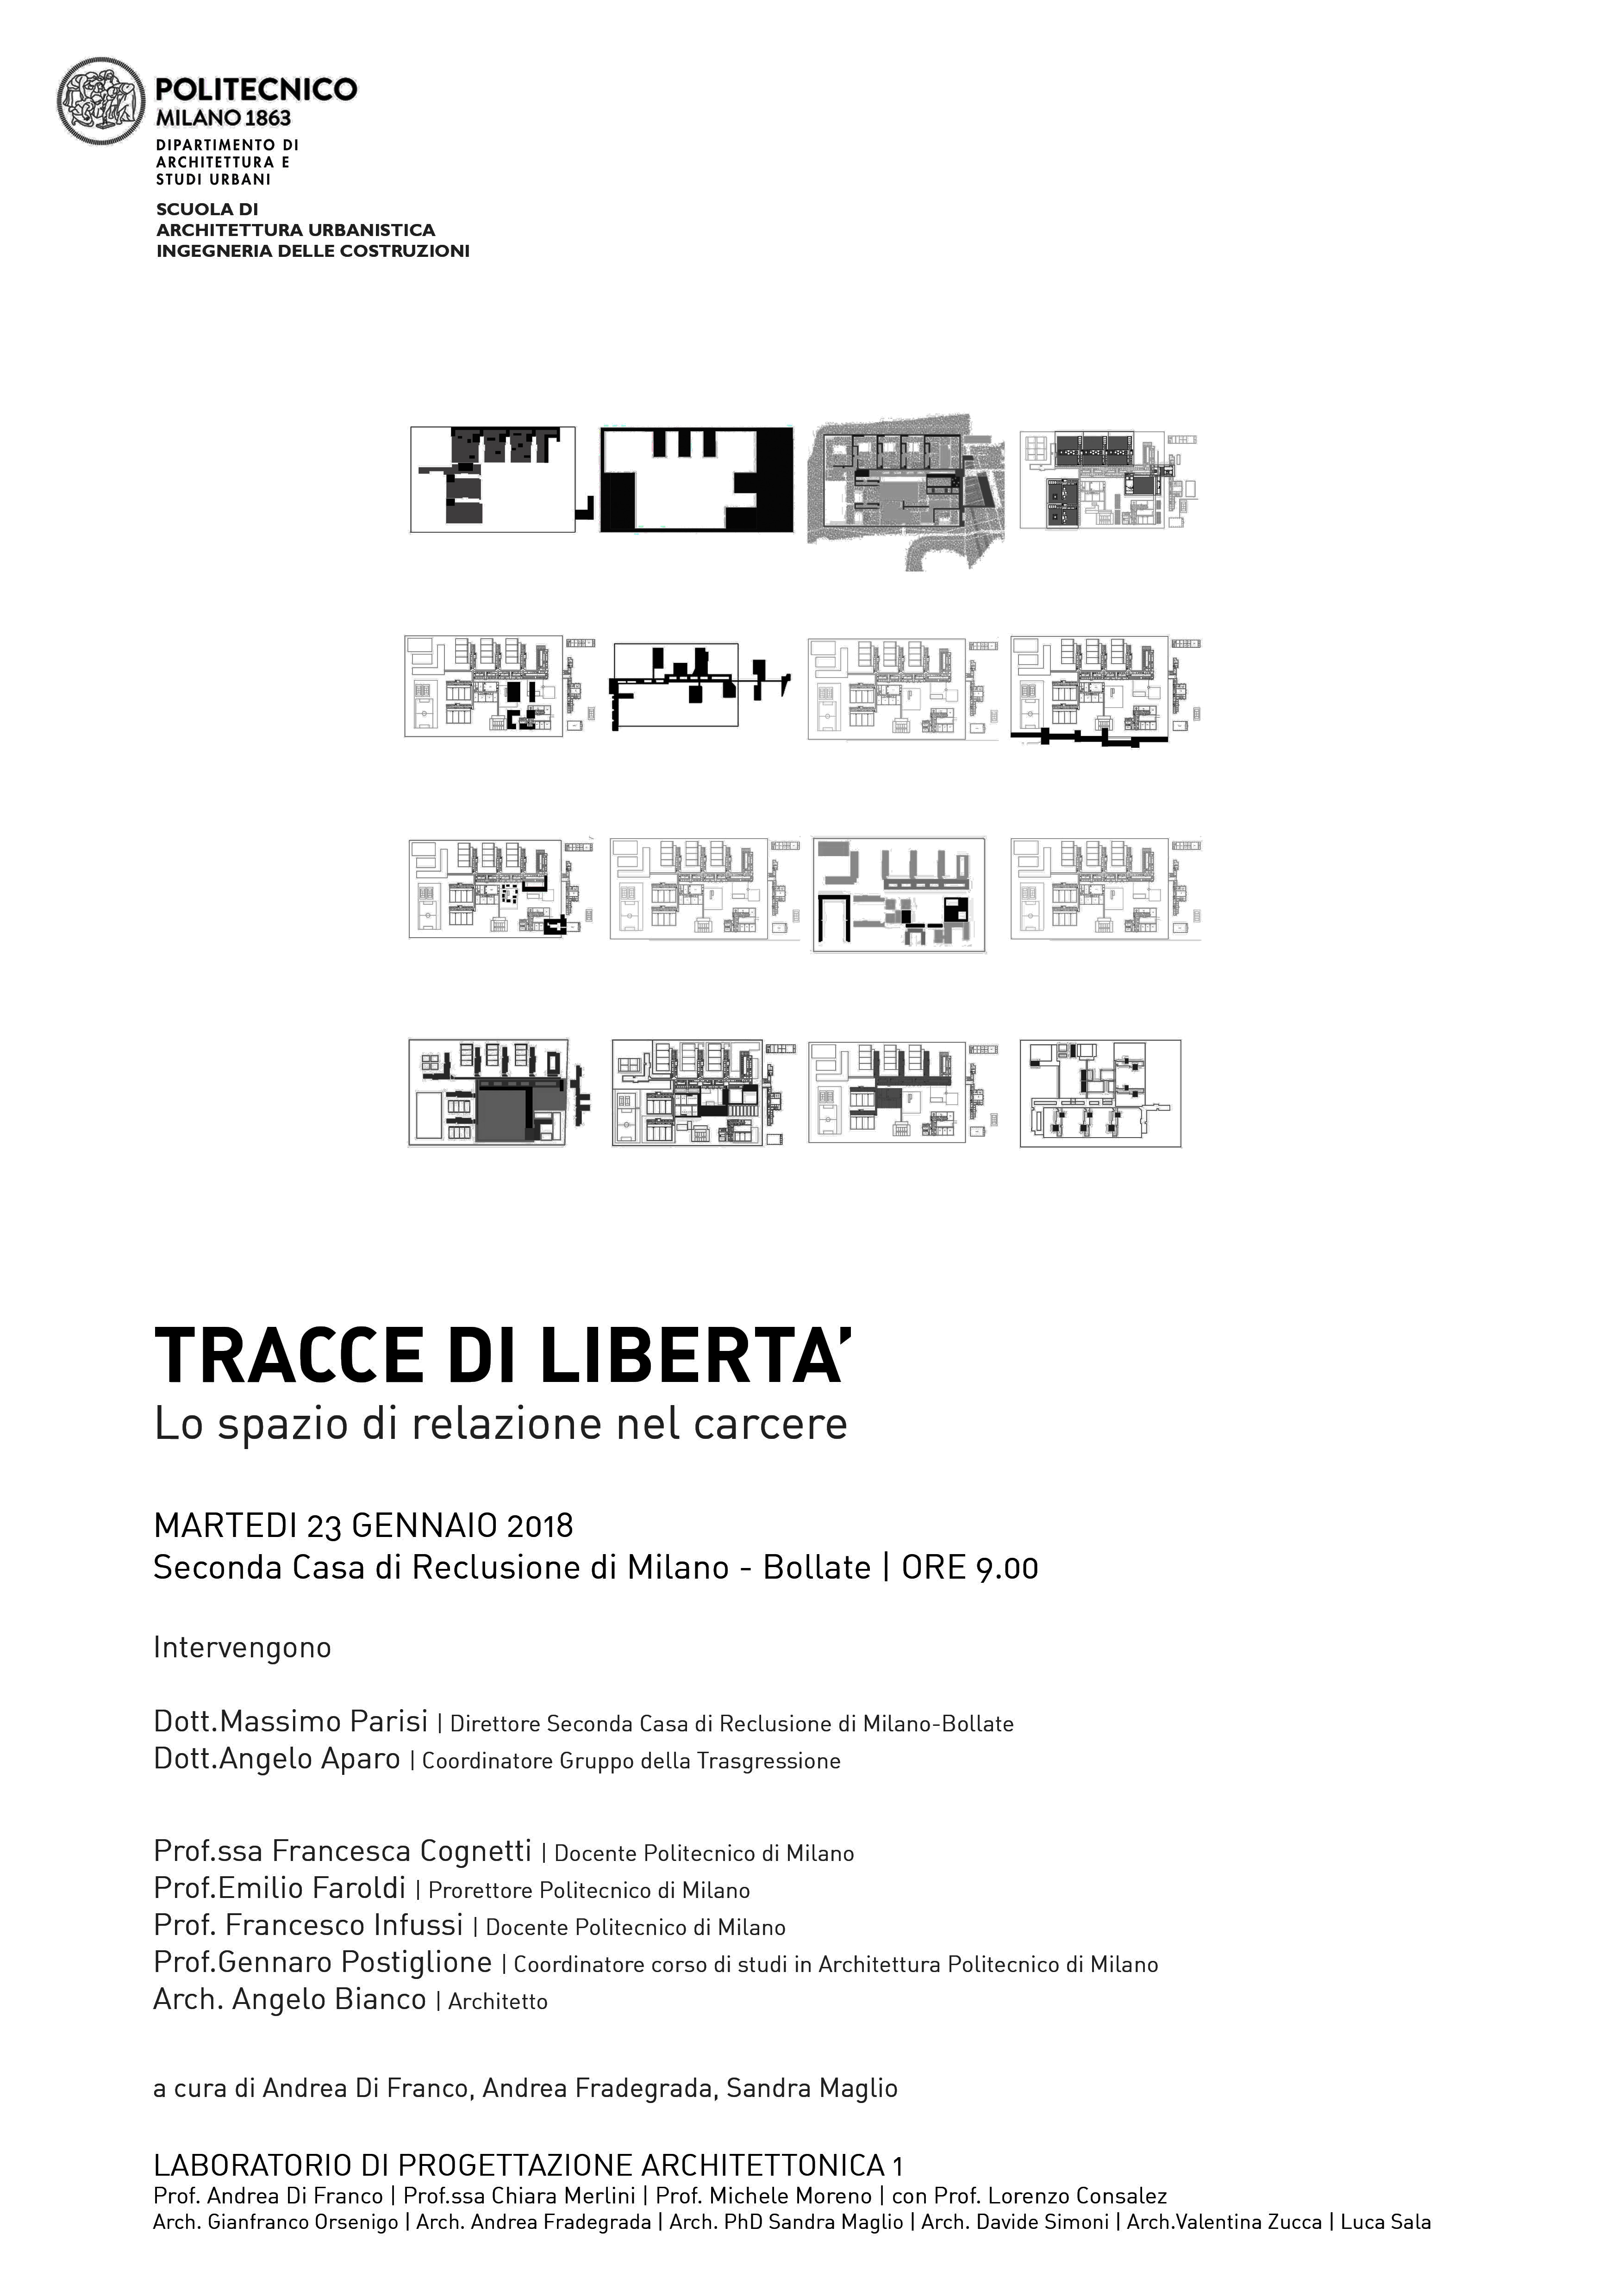 Calendario Politecnico Milano.Politecnico Milano Voci Dal Ponte